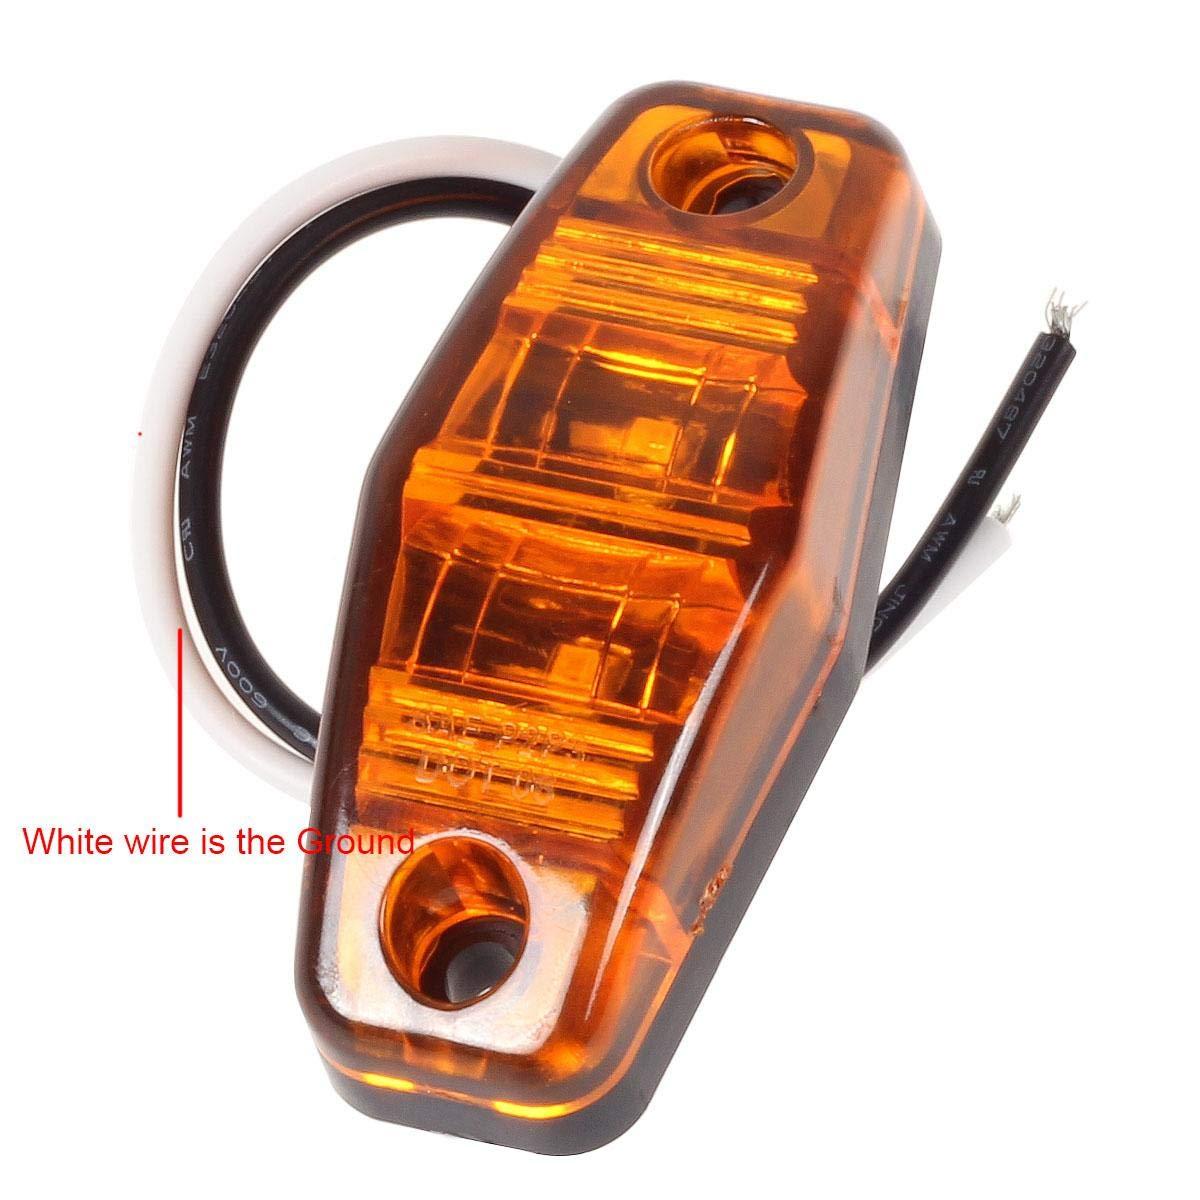 Flange Mount Led Marker Light Kit Sealed 12V Partsam 6 Stop Turn Brake Tail Light